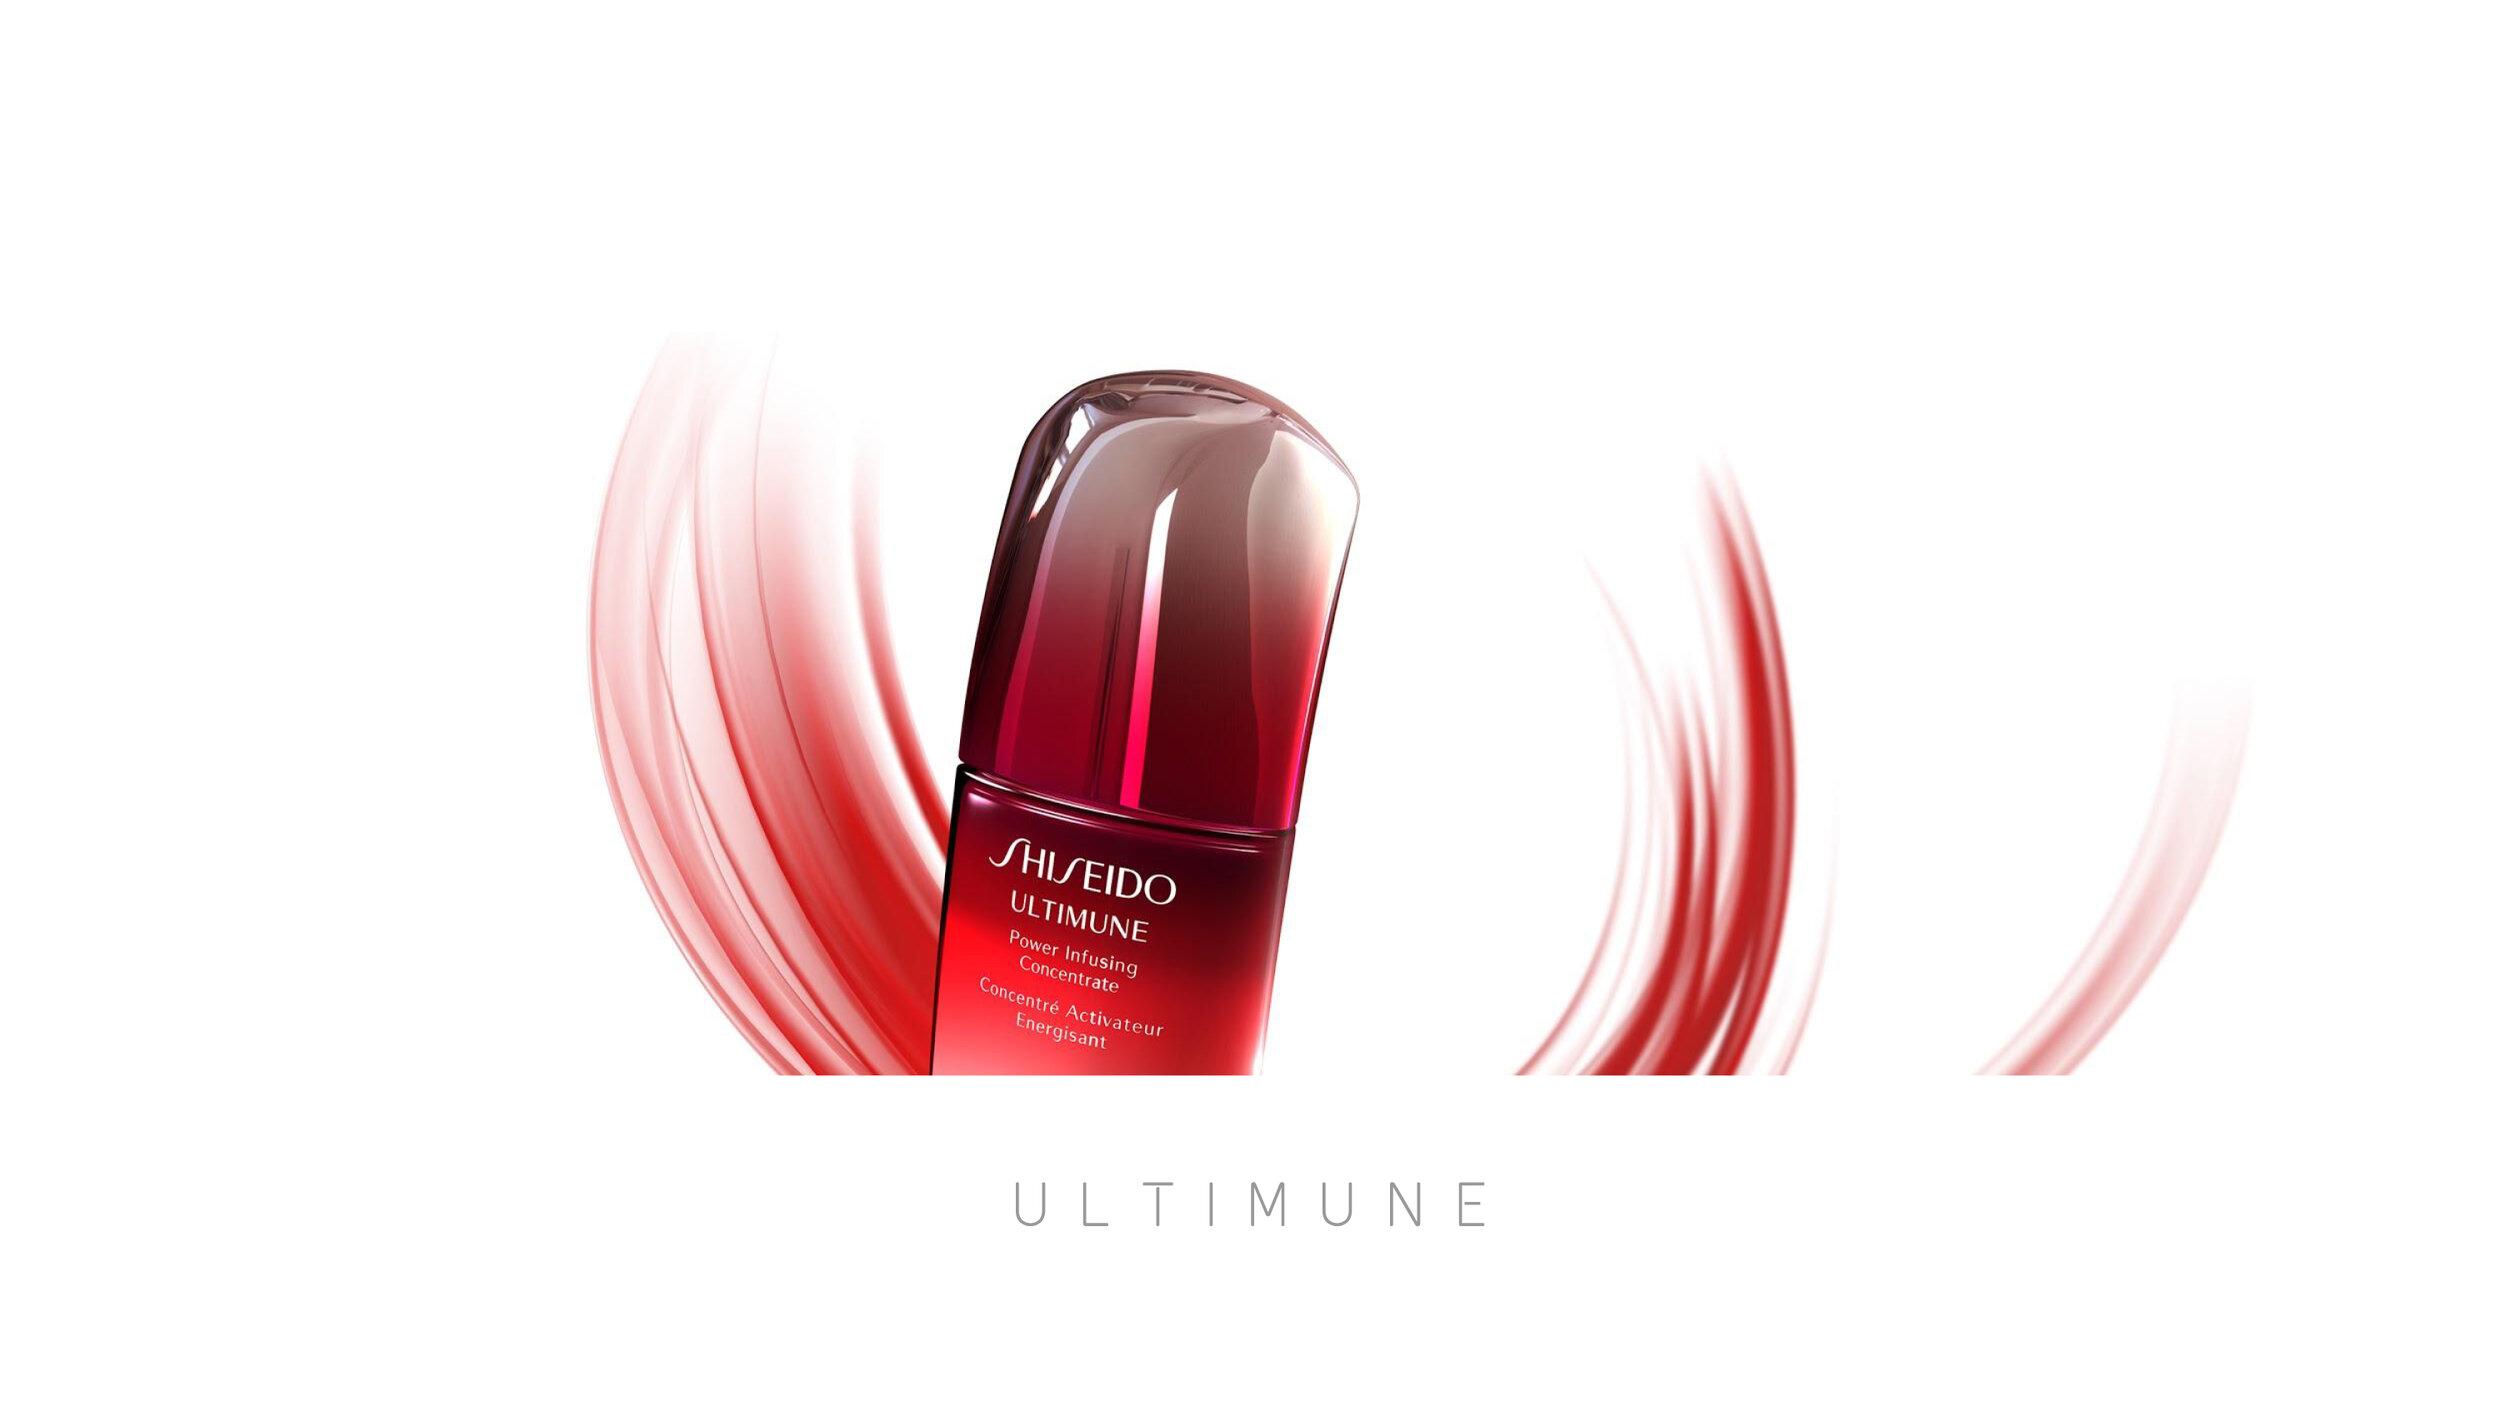 shiseido_brandbook_ultimune1.jpg